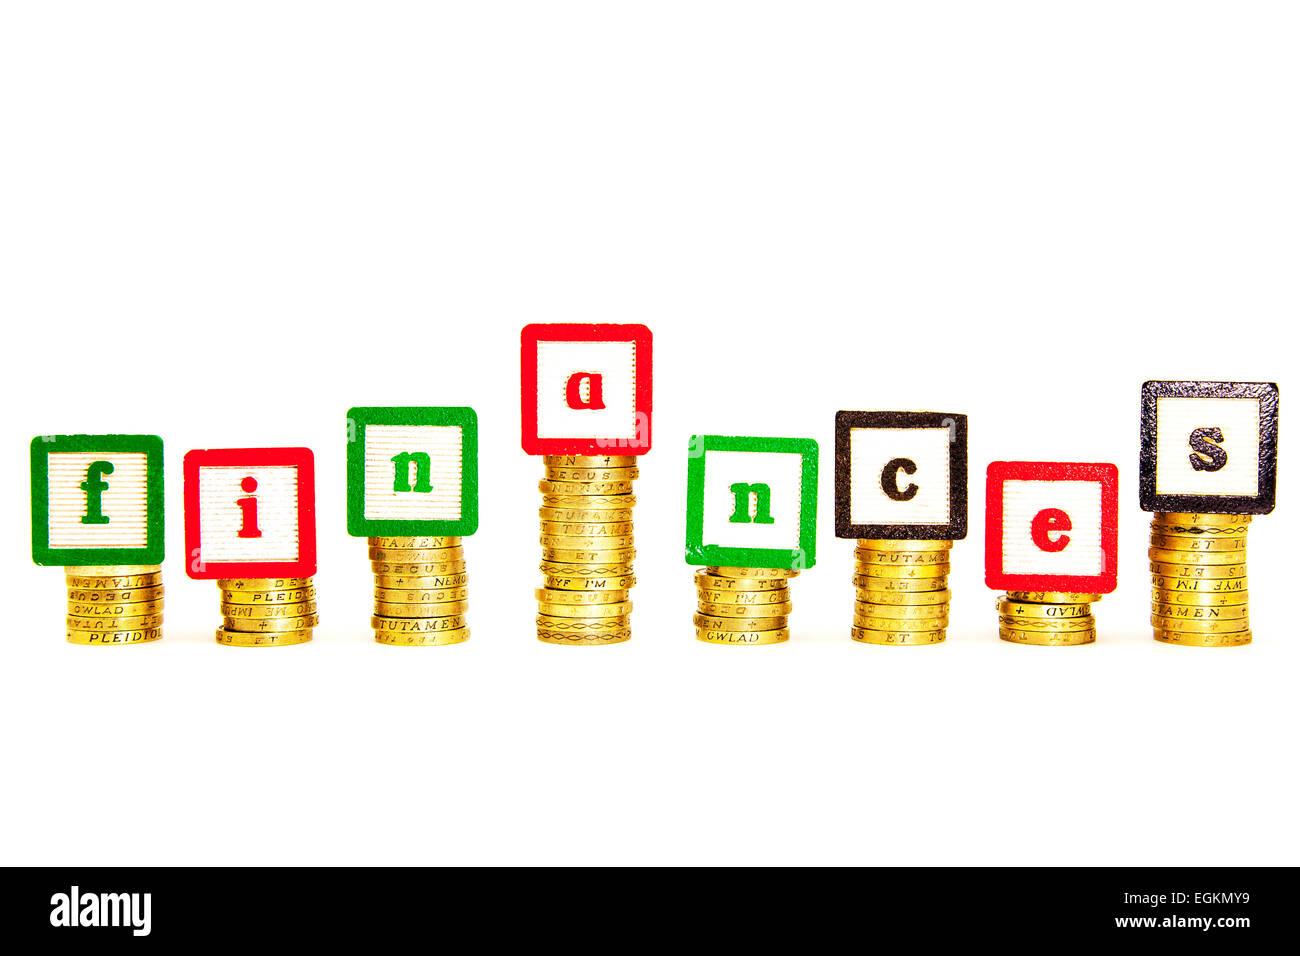 finances-finance-money-problems-cash-fund-funds-financial-credit-pounds-EGKMY9.jpg